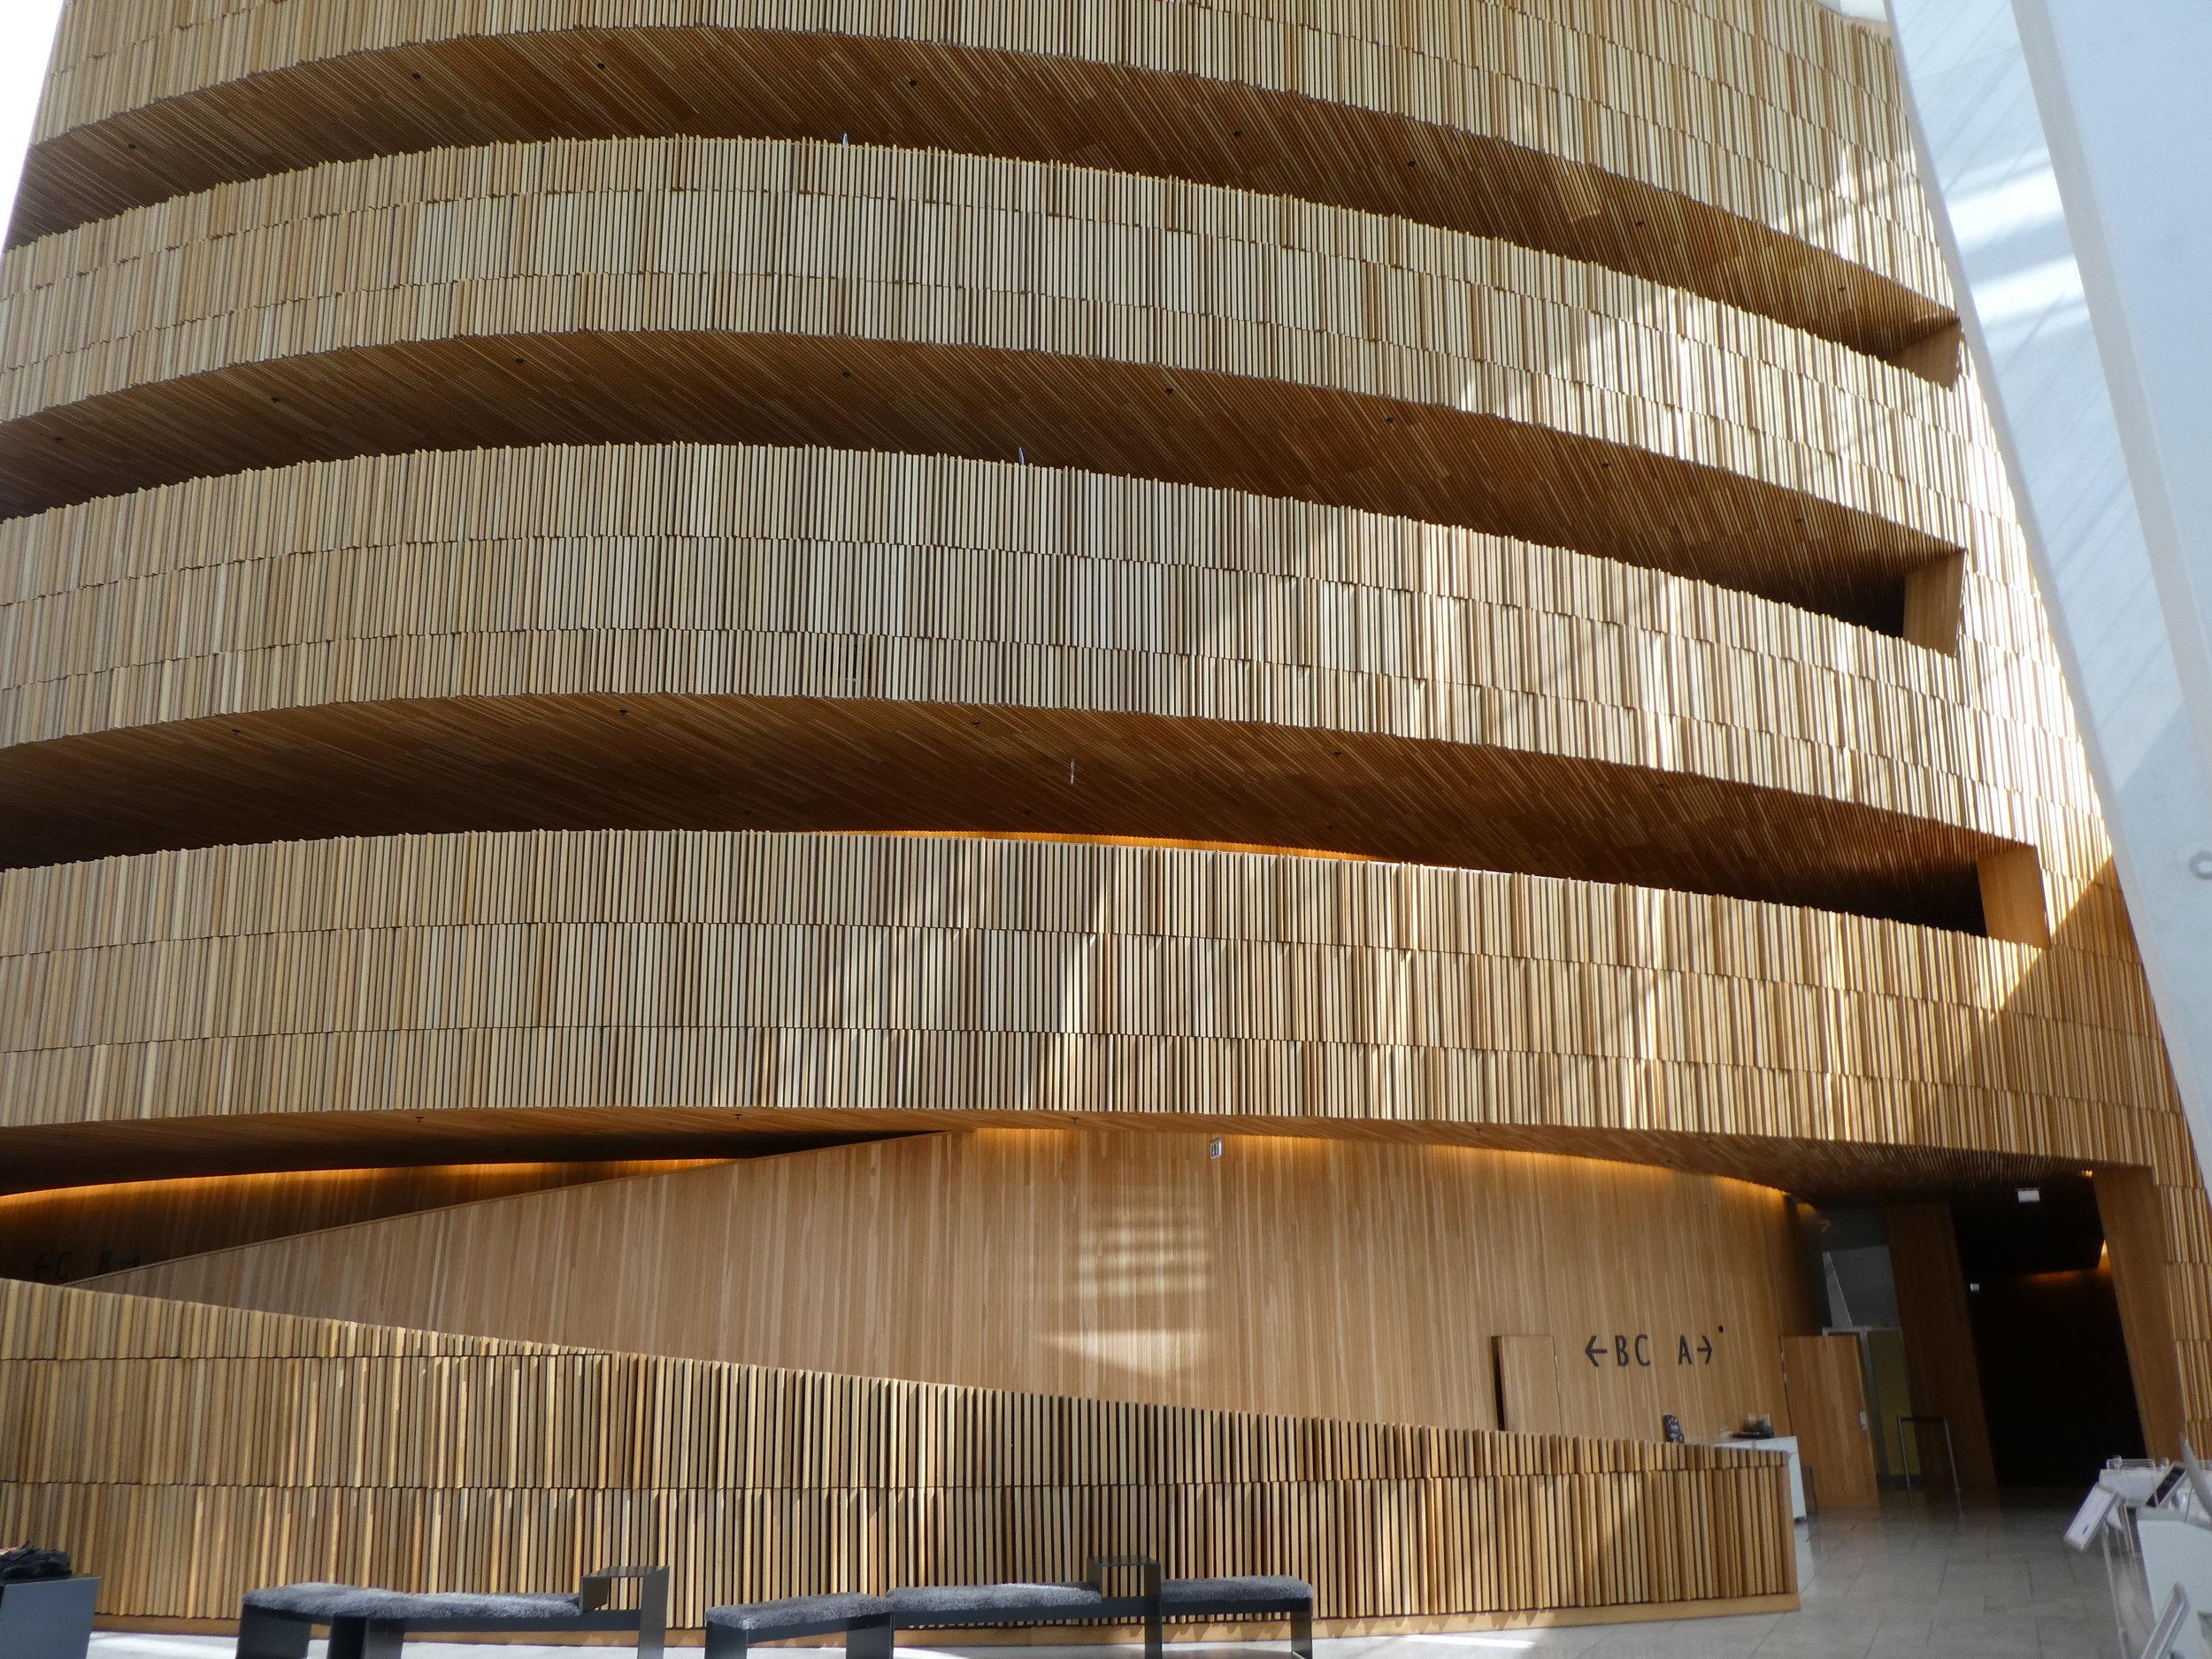 More Norwegian wood at the Oslo Opera House.